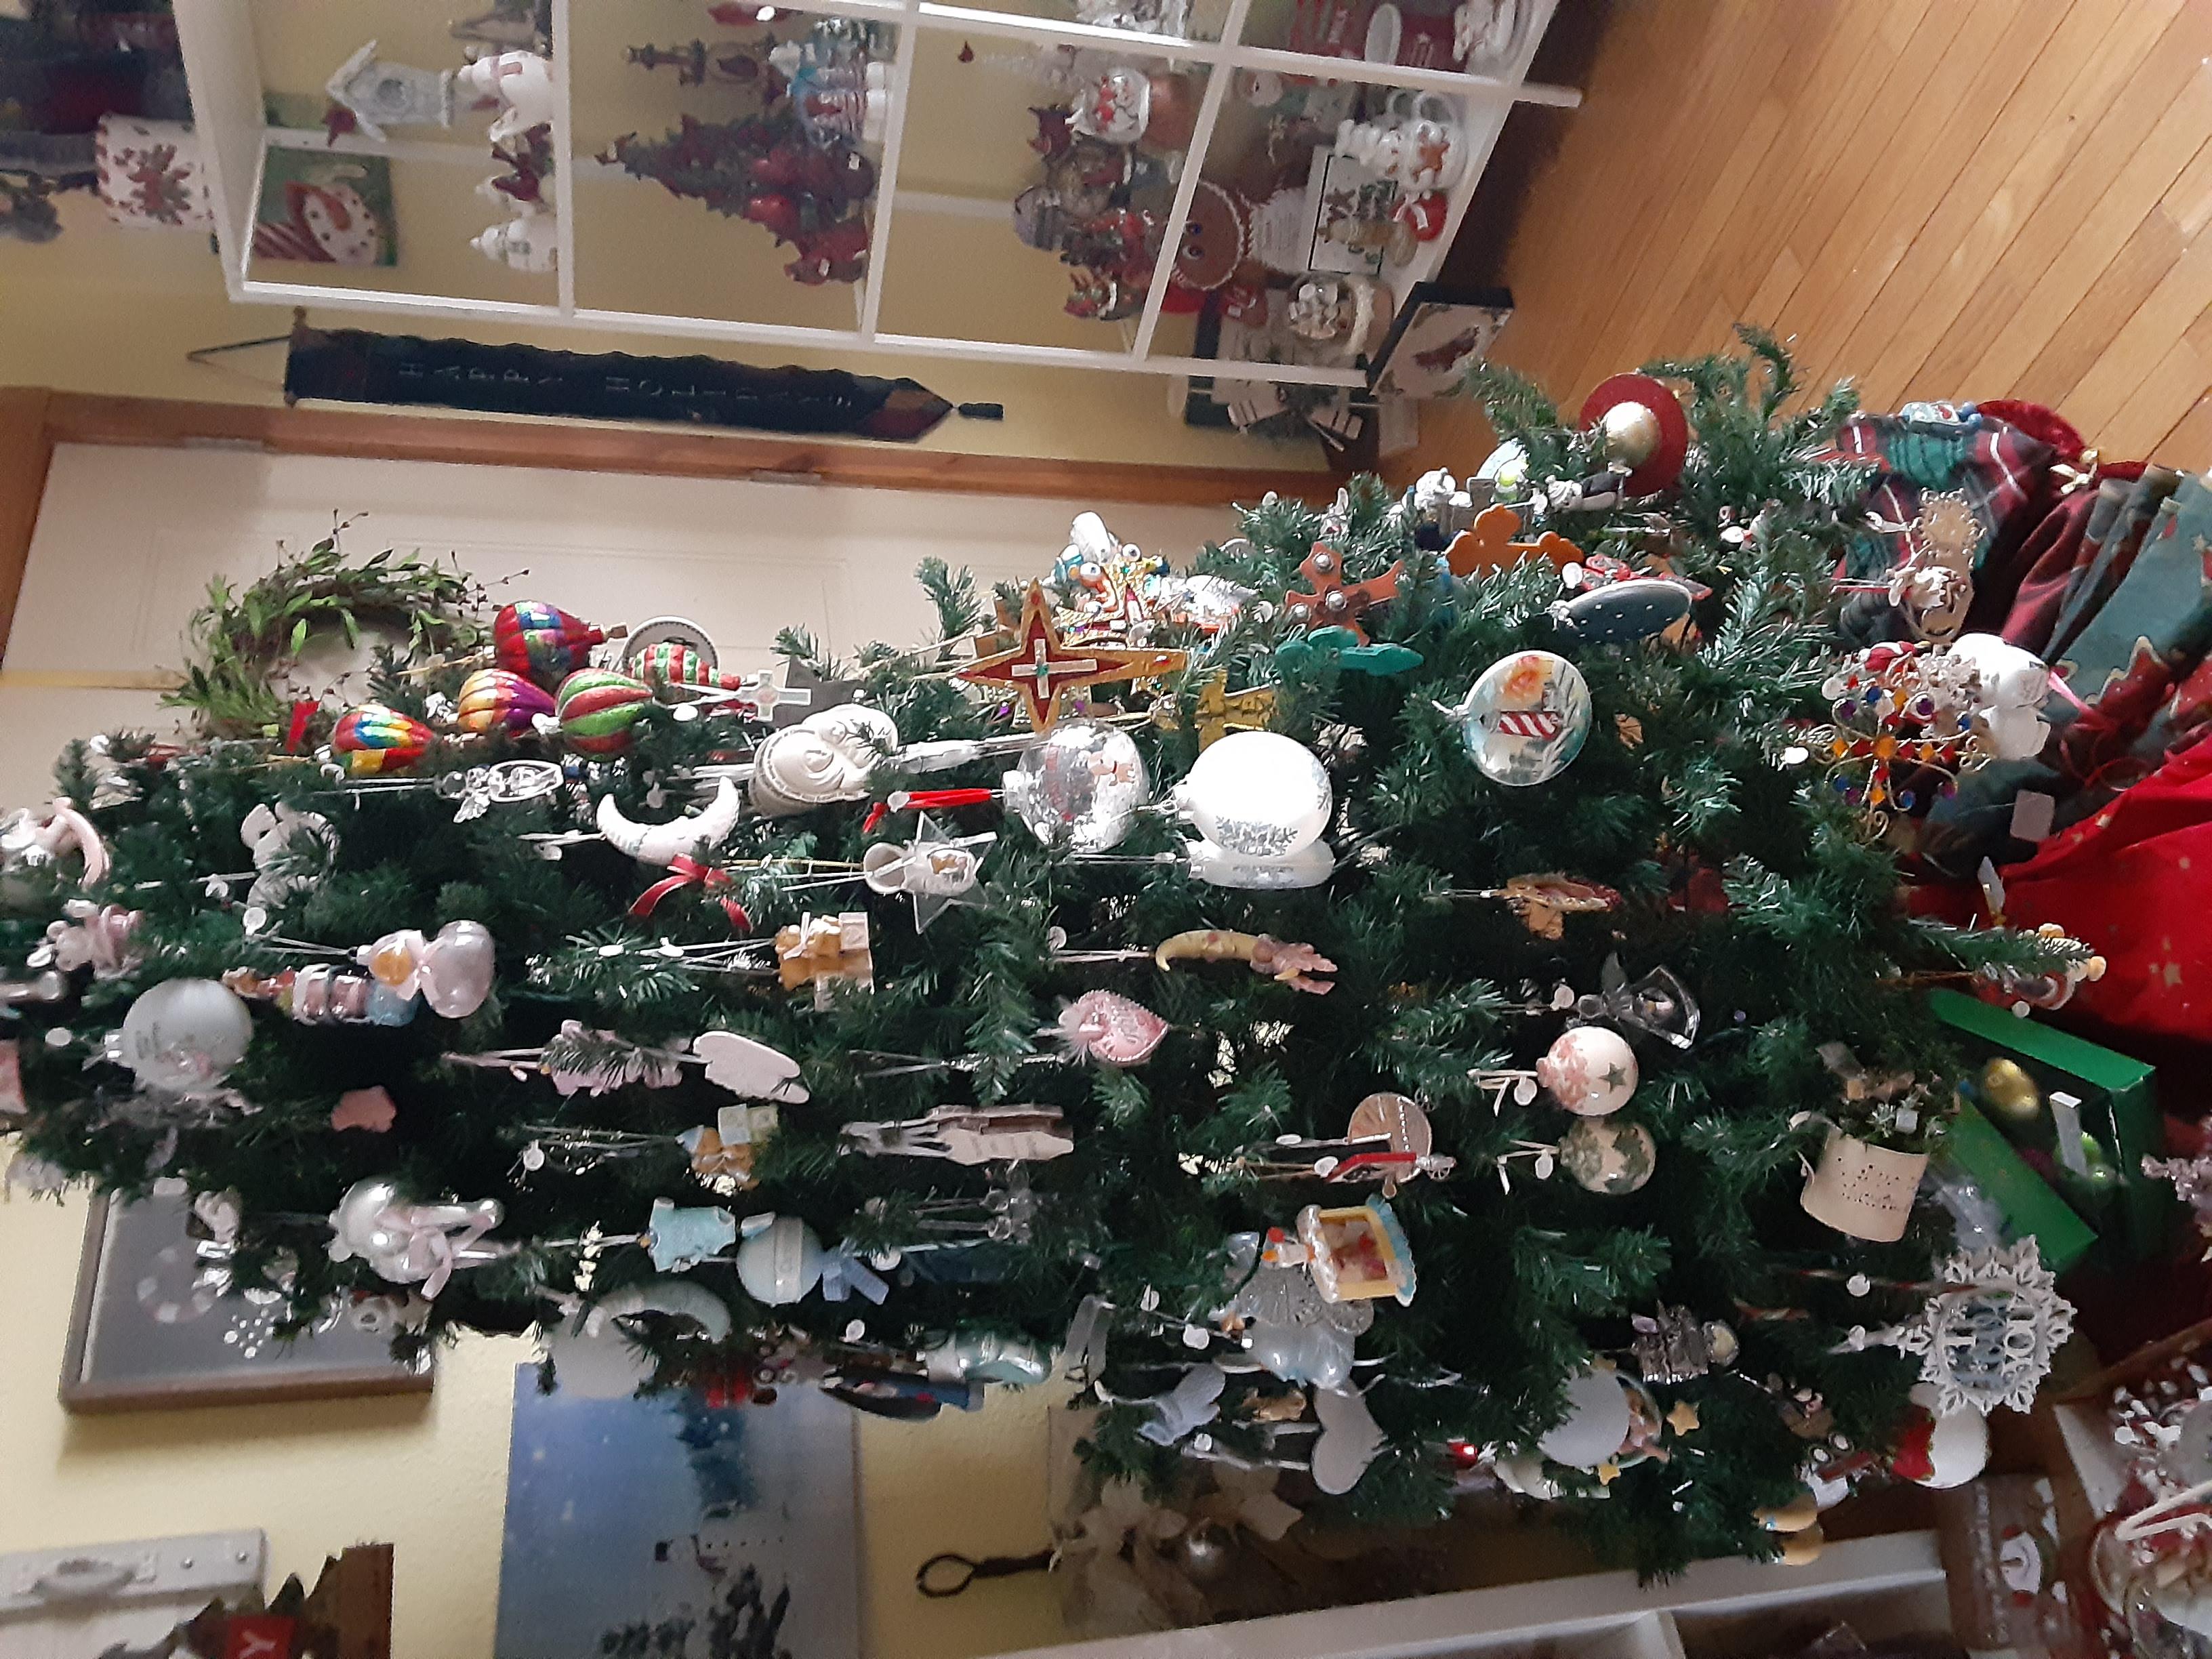 One of 6 xmas trees full of ornaments